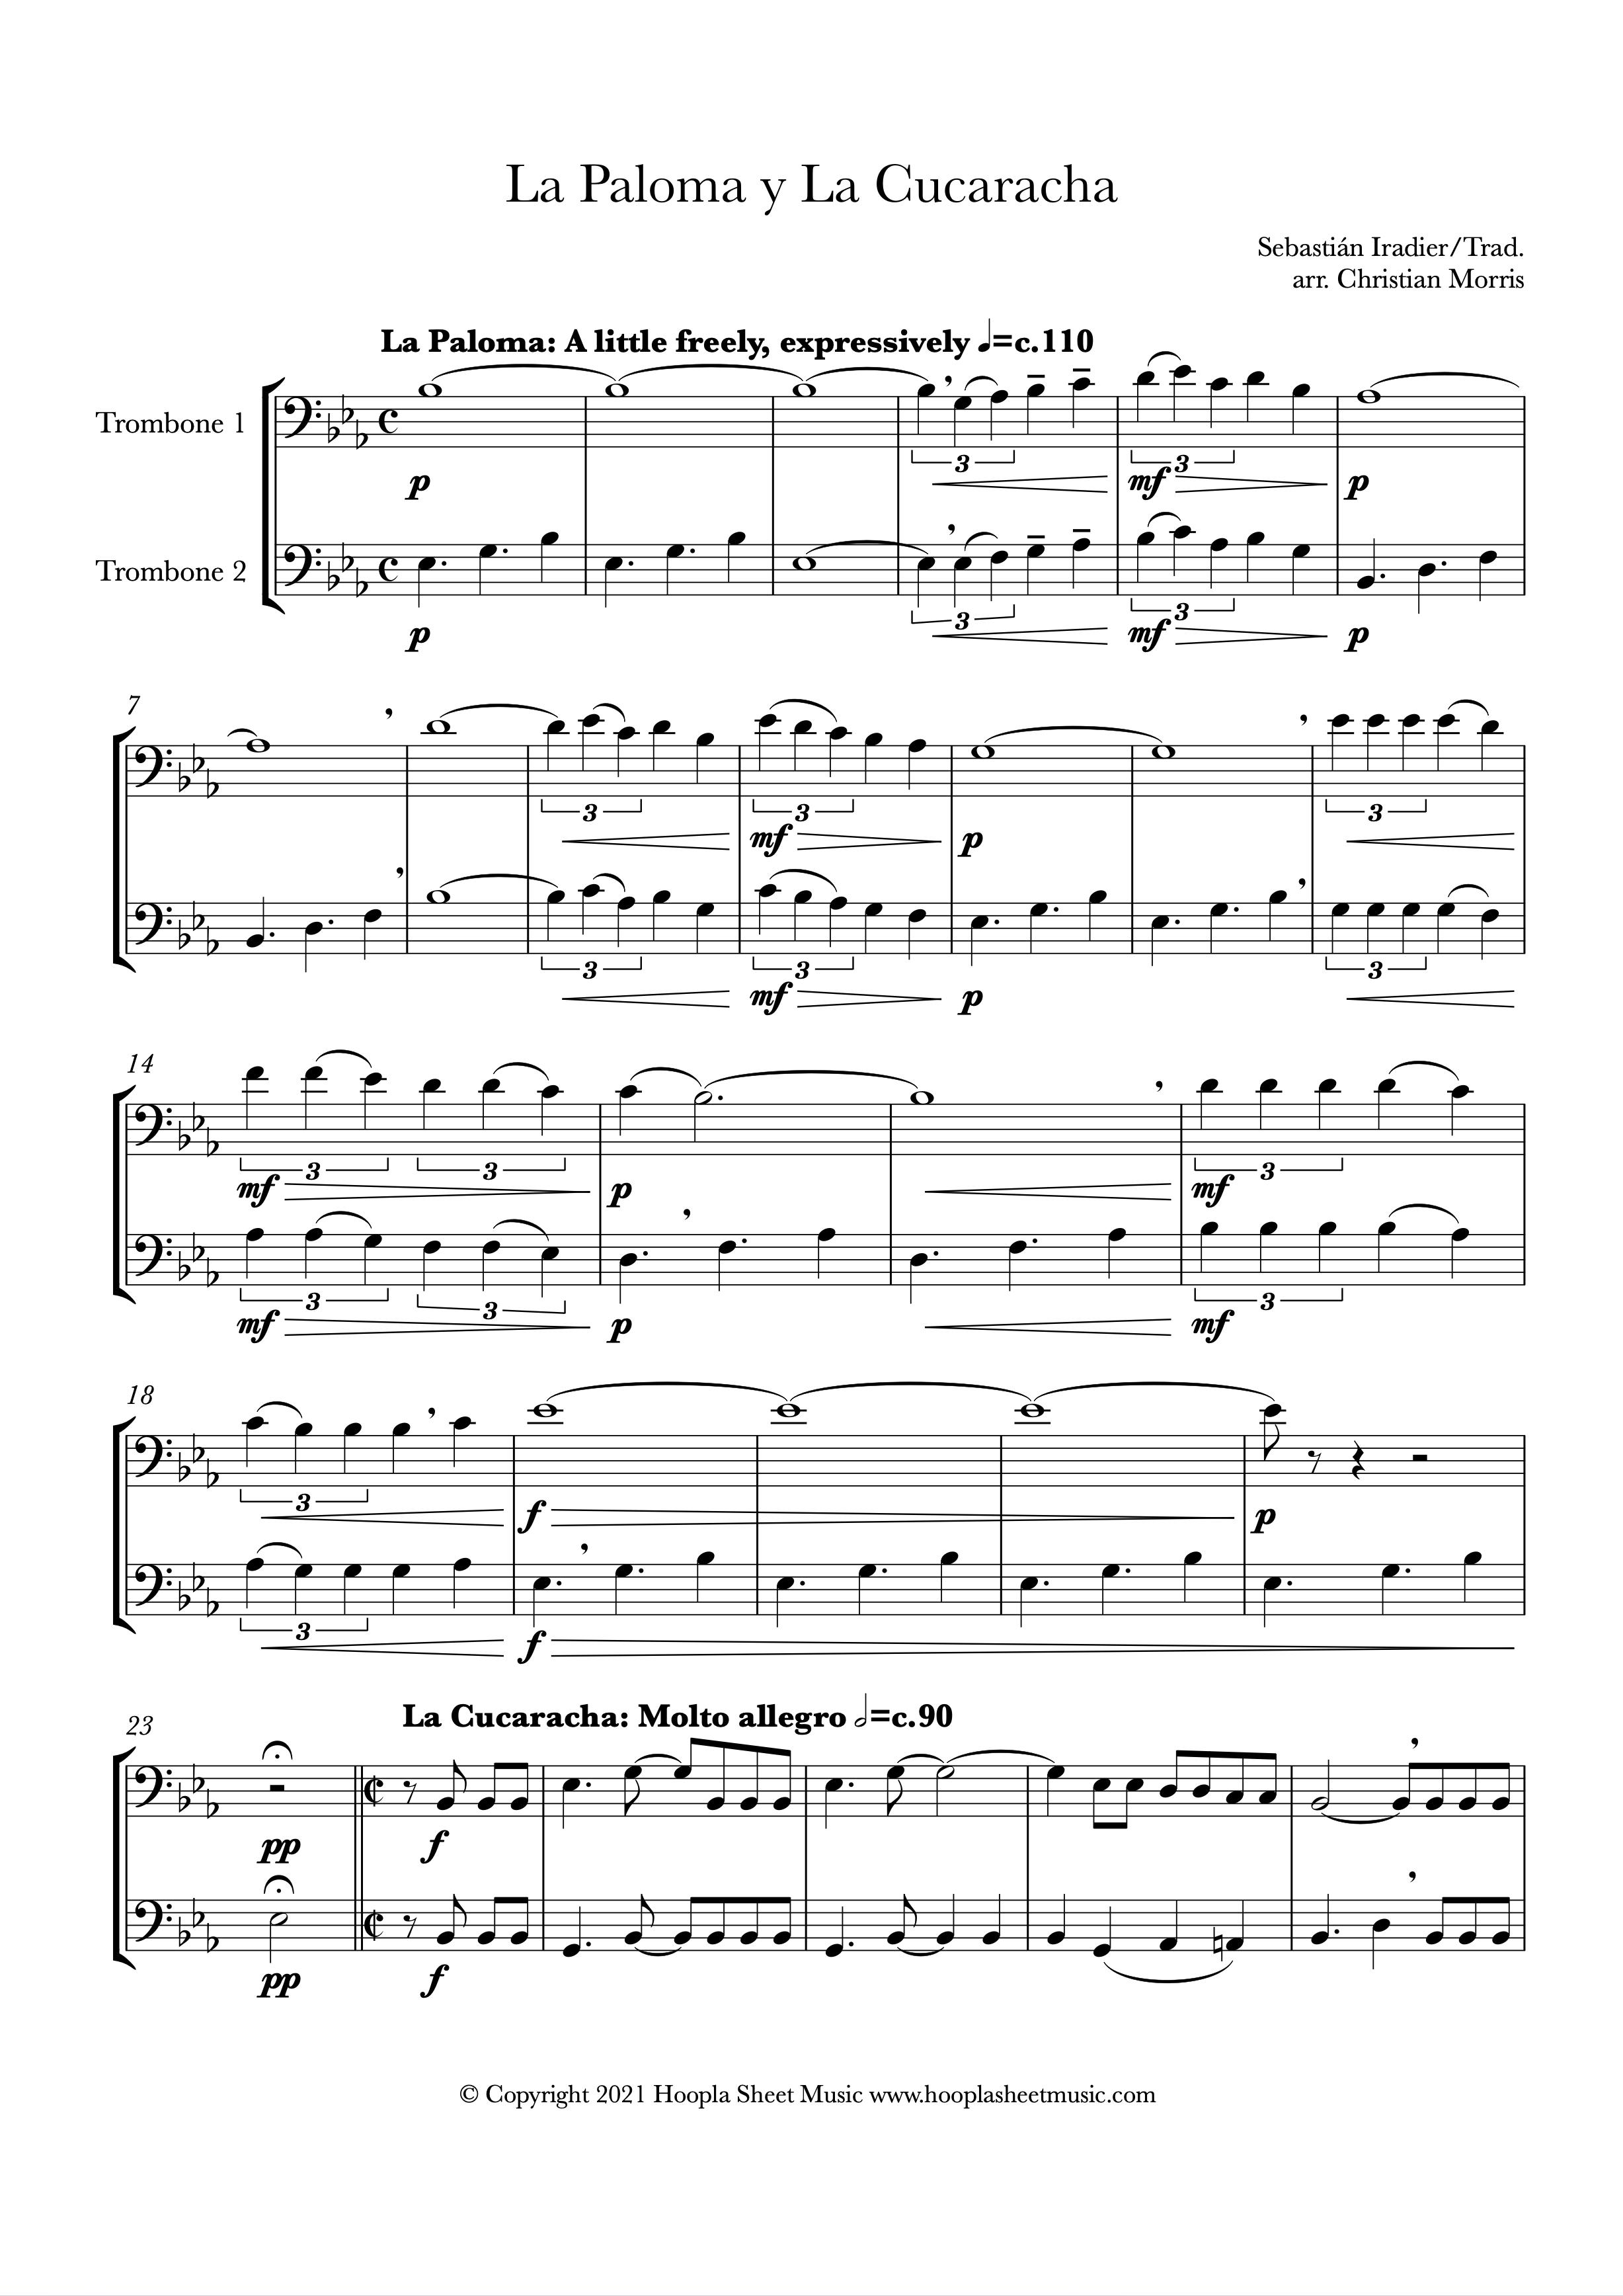 La Paloma y La Cucaracha (Trombone Duet)